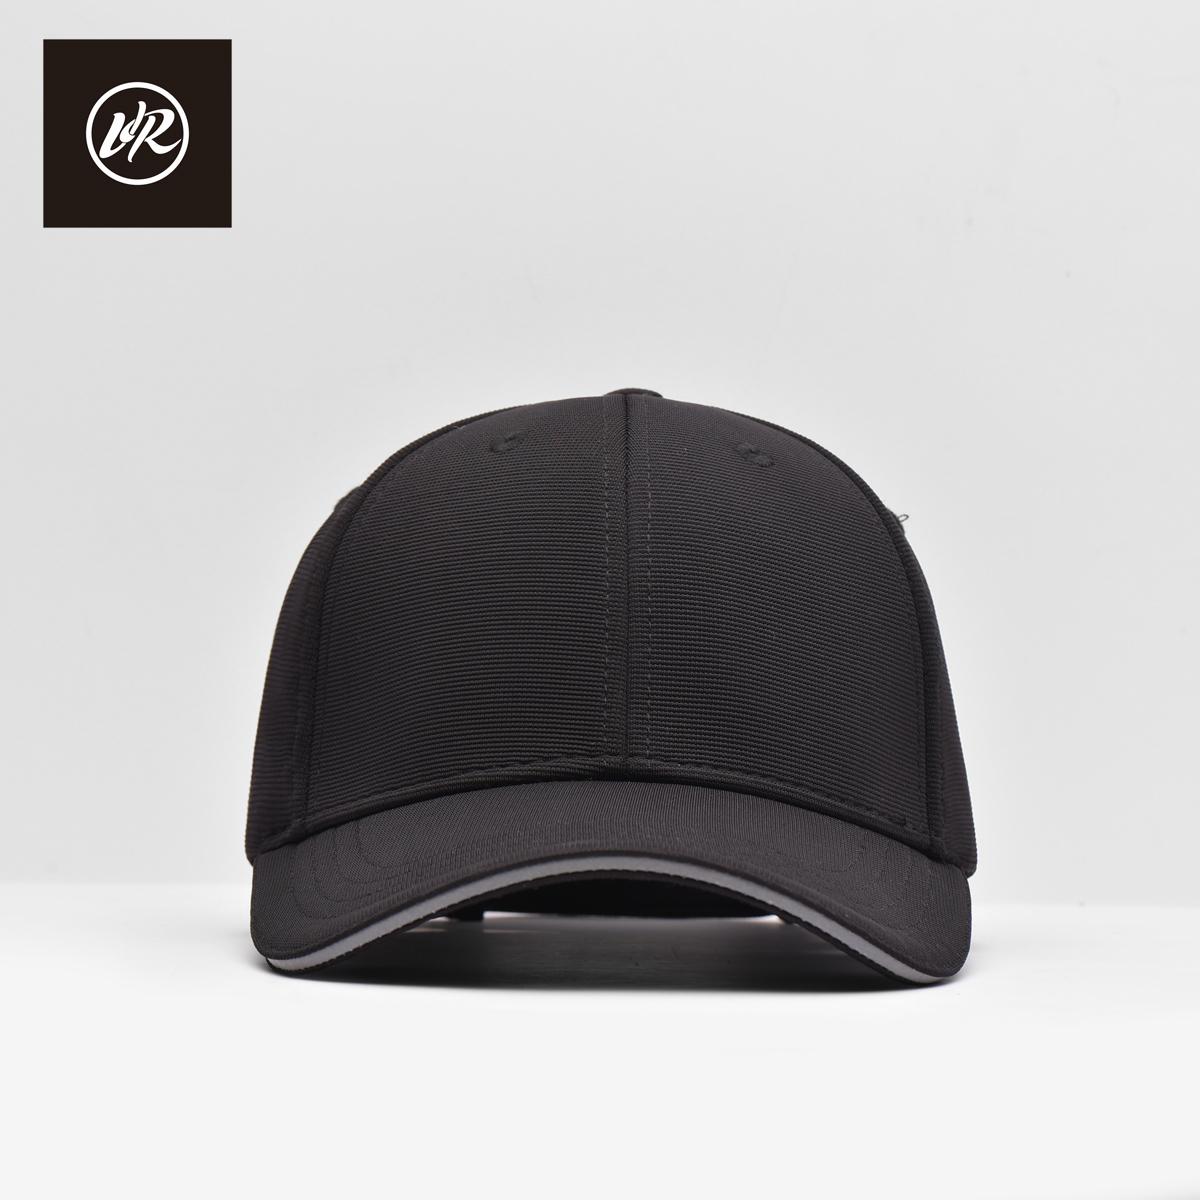 ... Korea Fashion Style ms dilipat Cooljie topi pantai topi Biru tua Source Musim panas topi topi